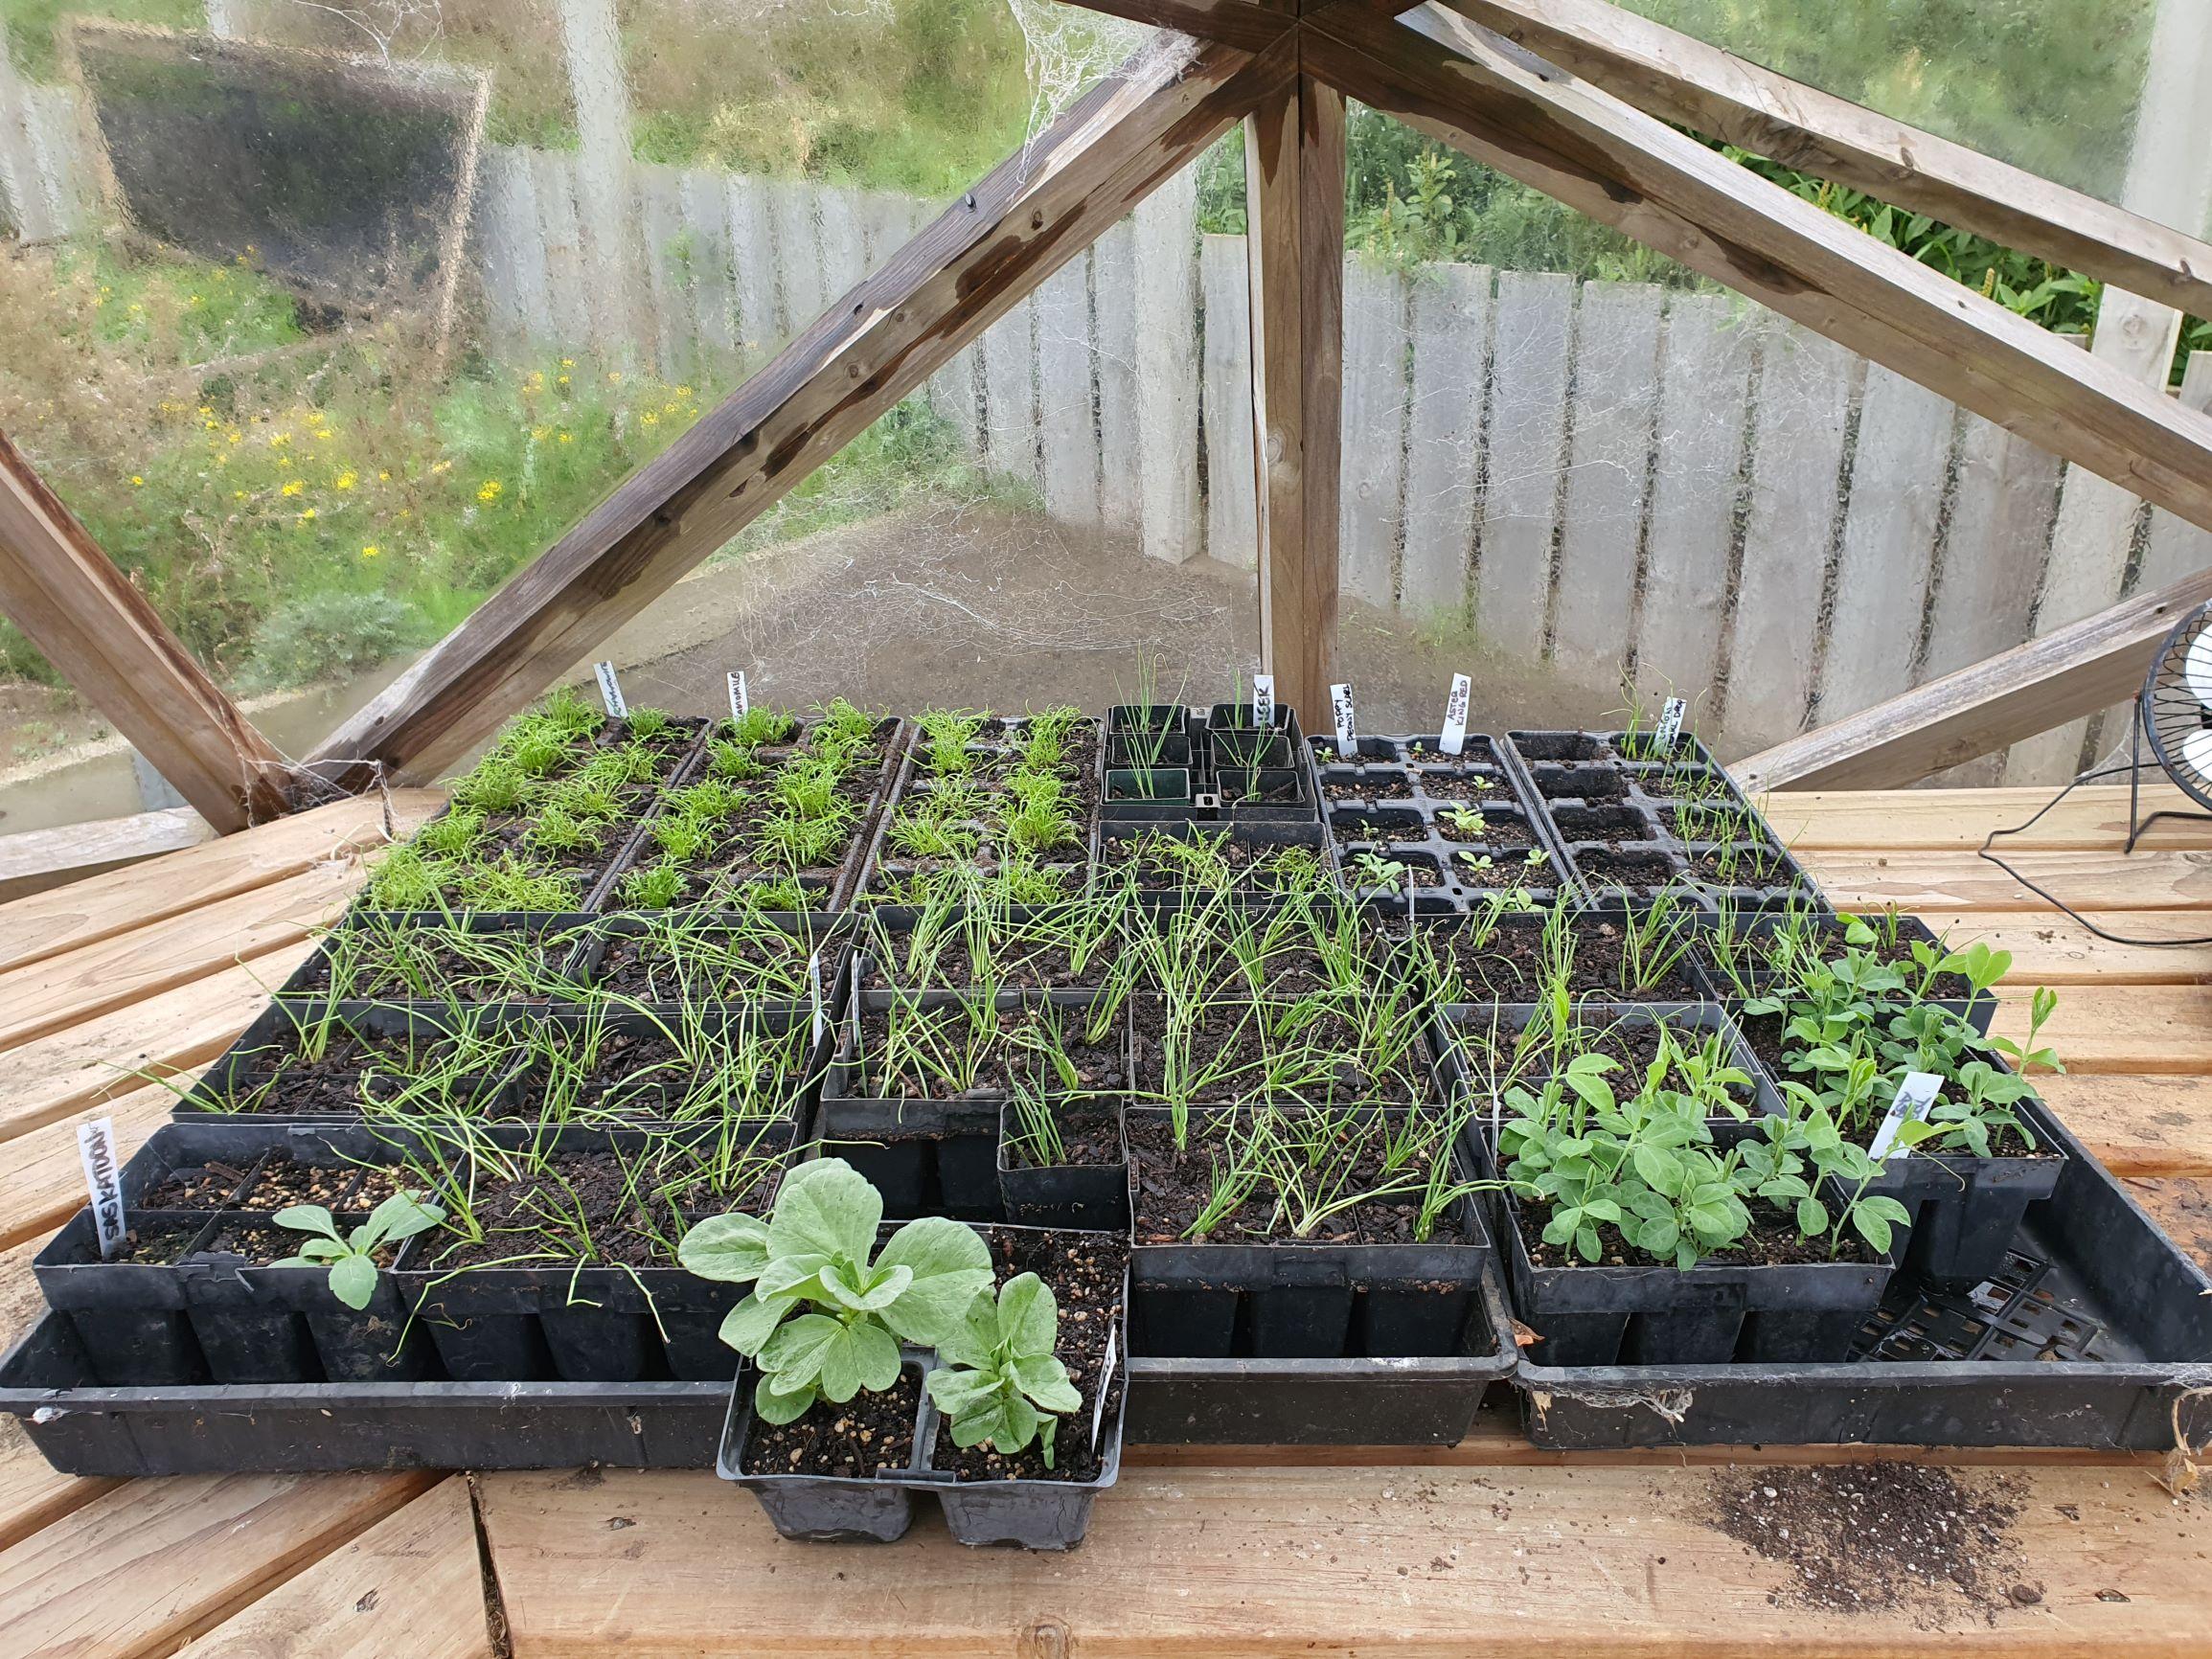 autumn seedlings